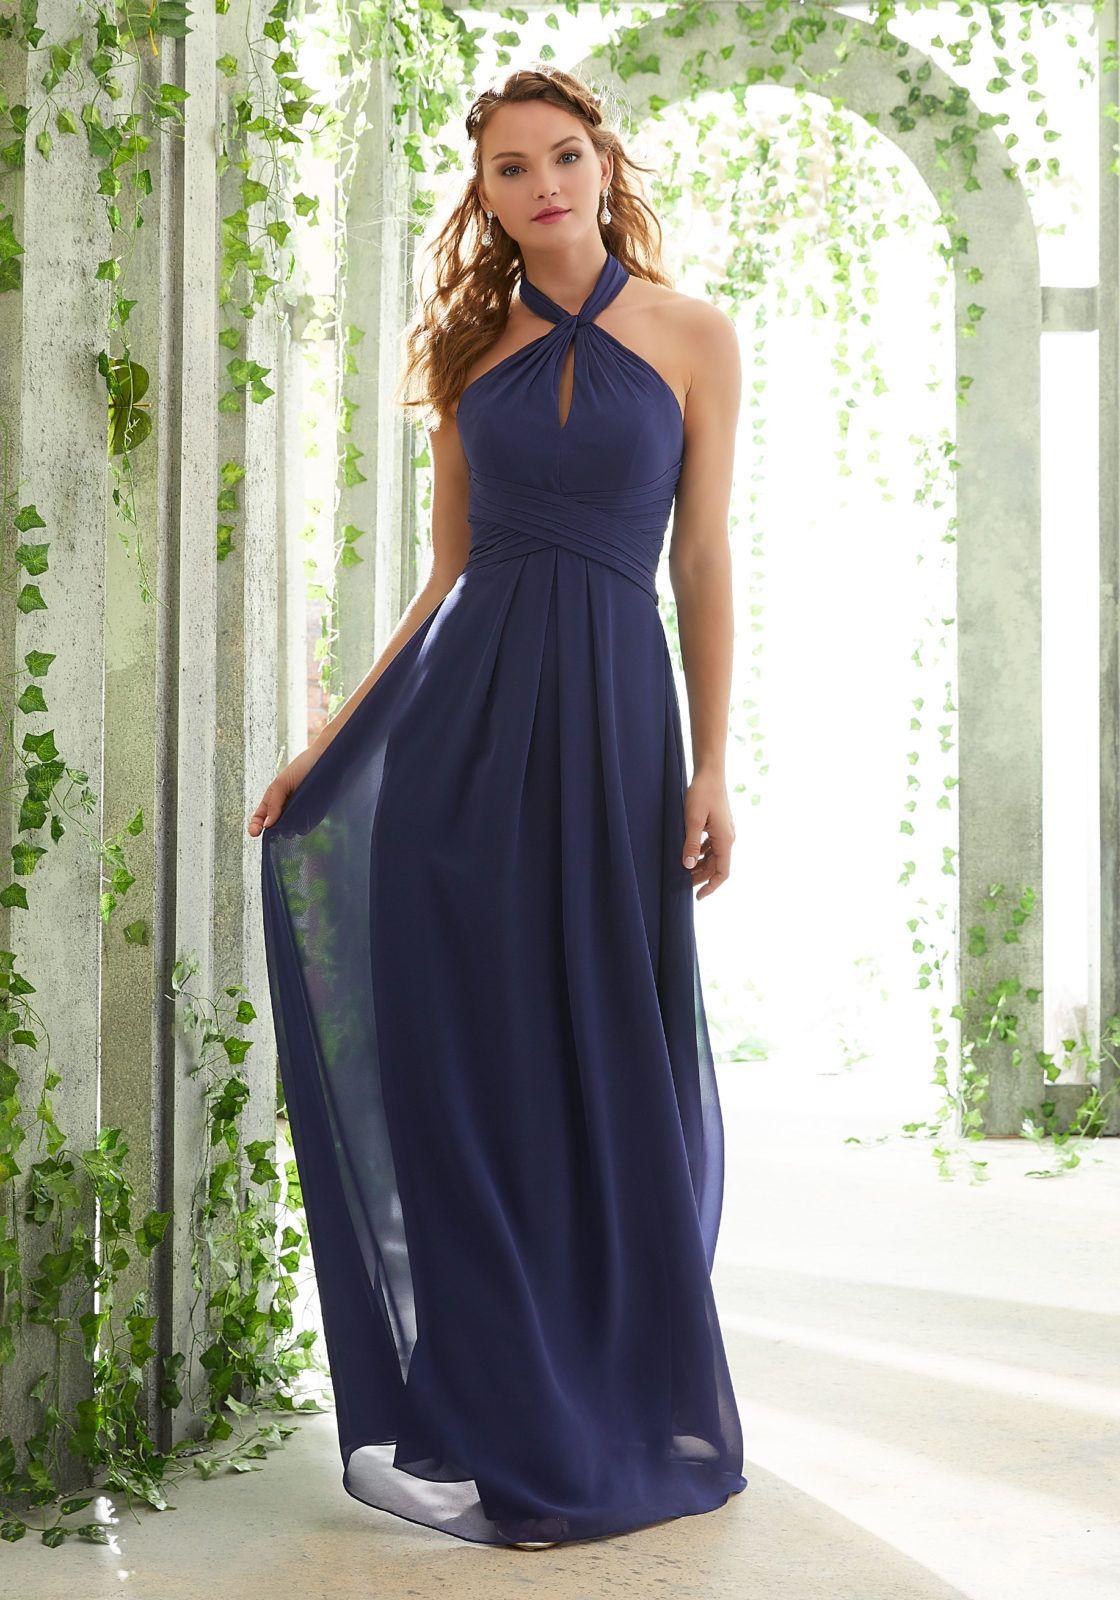 c51ecec966 Morilee 21616 Stylish Chiffon Bridesmaid Dress with Criss Cross Neckline